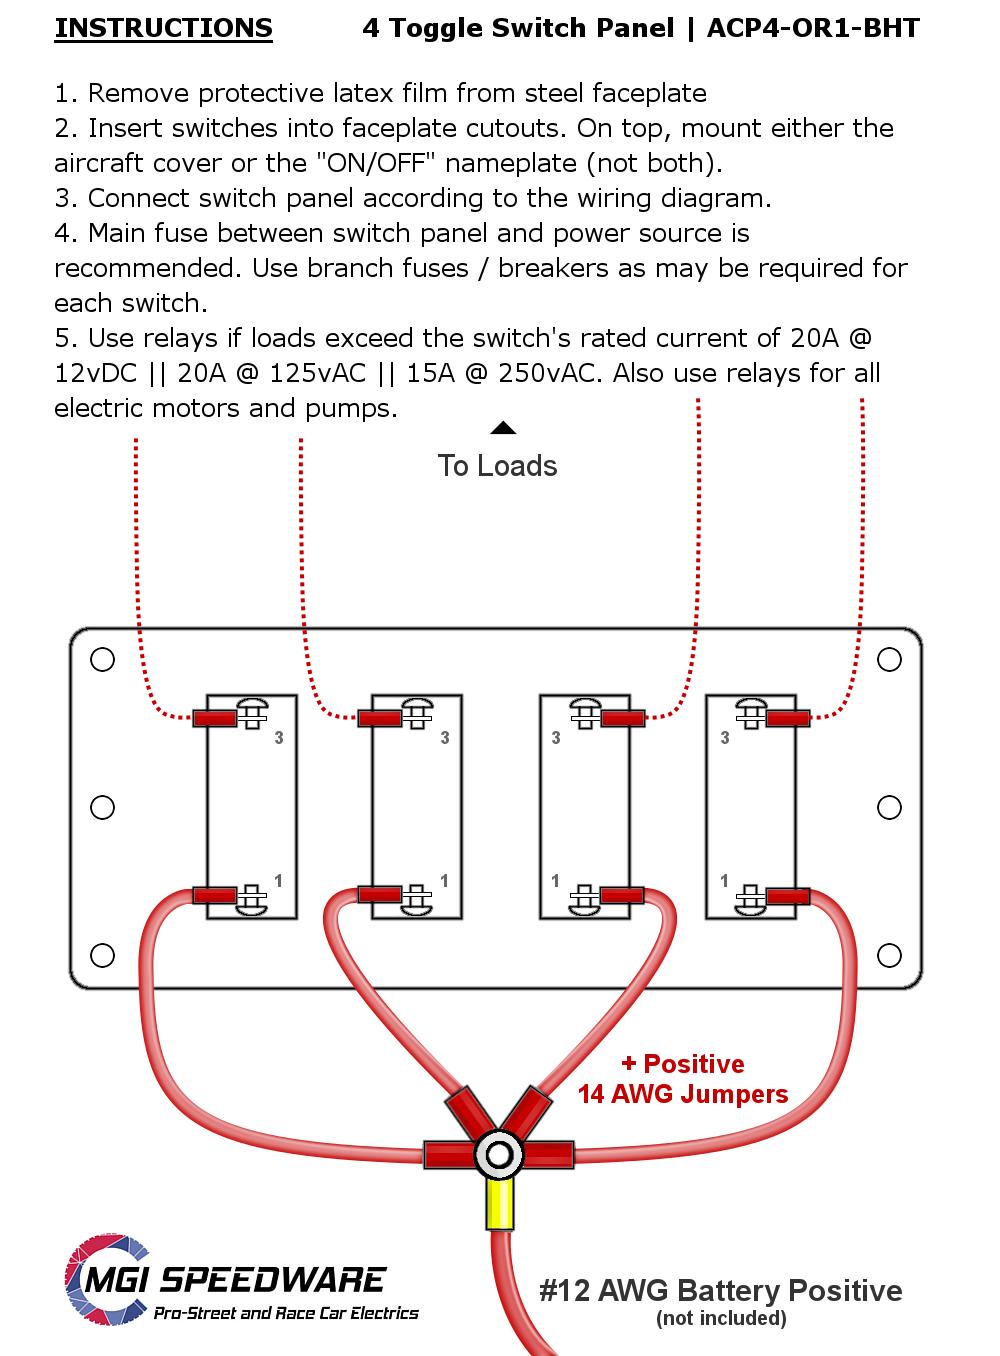 SCP4-OR1-BHT-wiring-diagram Quick Car Ignition Control Panel Wiring Diagram on electrical symbols, mdb9100awb, sdmo telys 2 digital, sump pump, olympian generator, med5600tq0, ex200 fire, baler d1000,